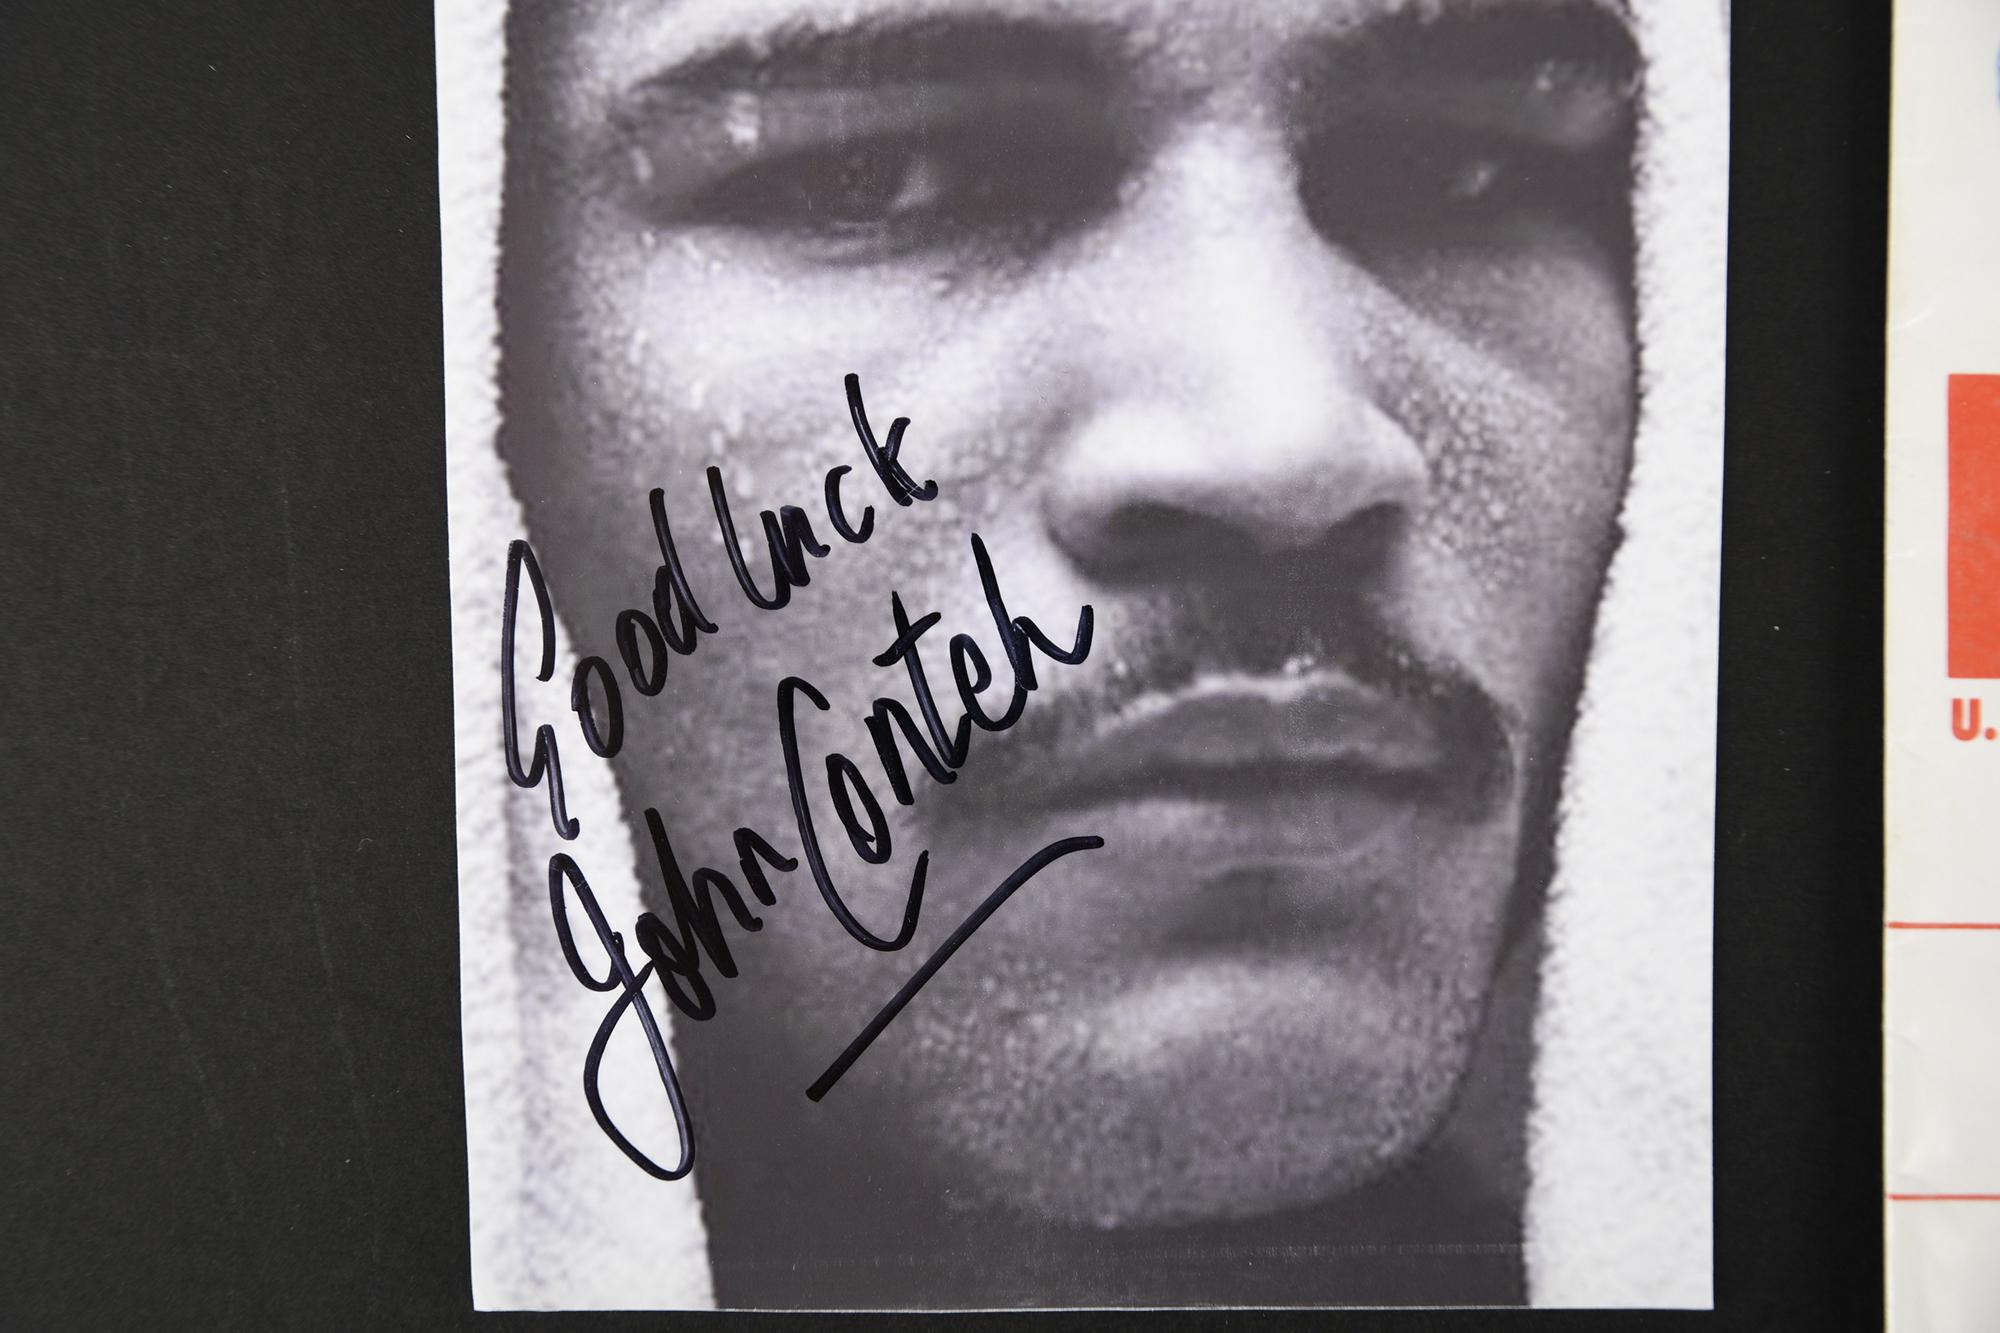 JOHN CONTEH Original signature on photo. - Image 2 of 3